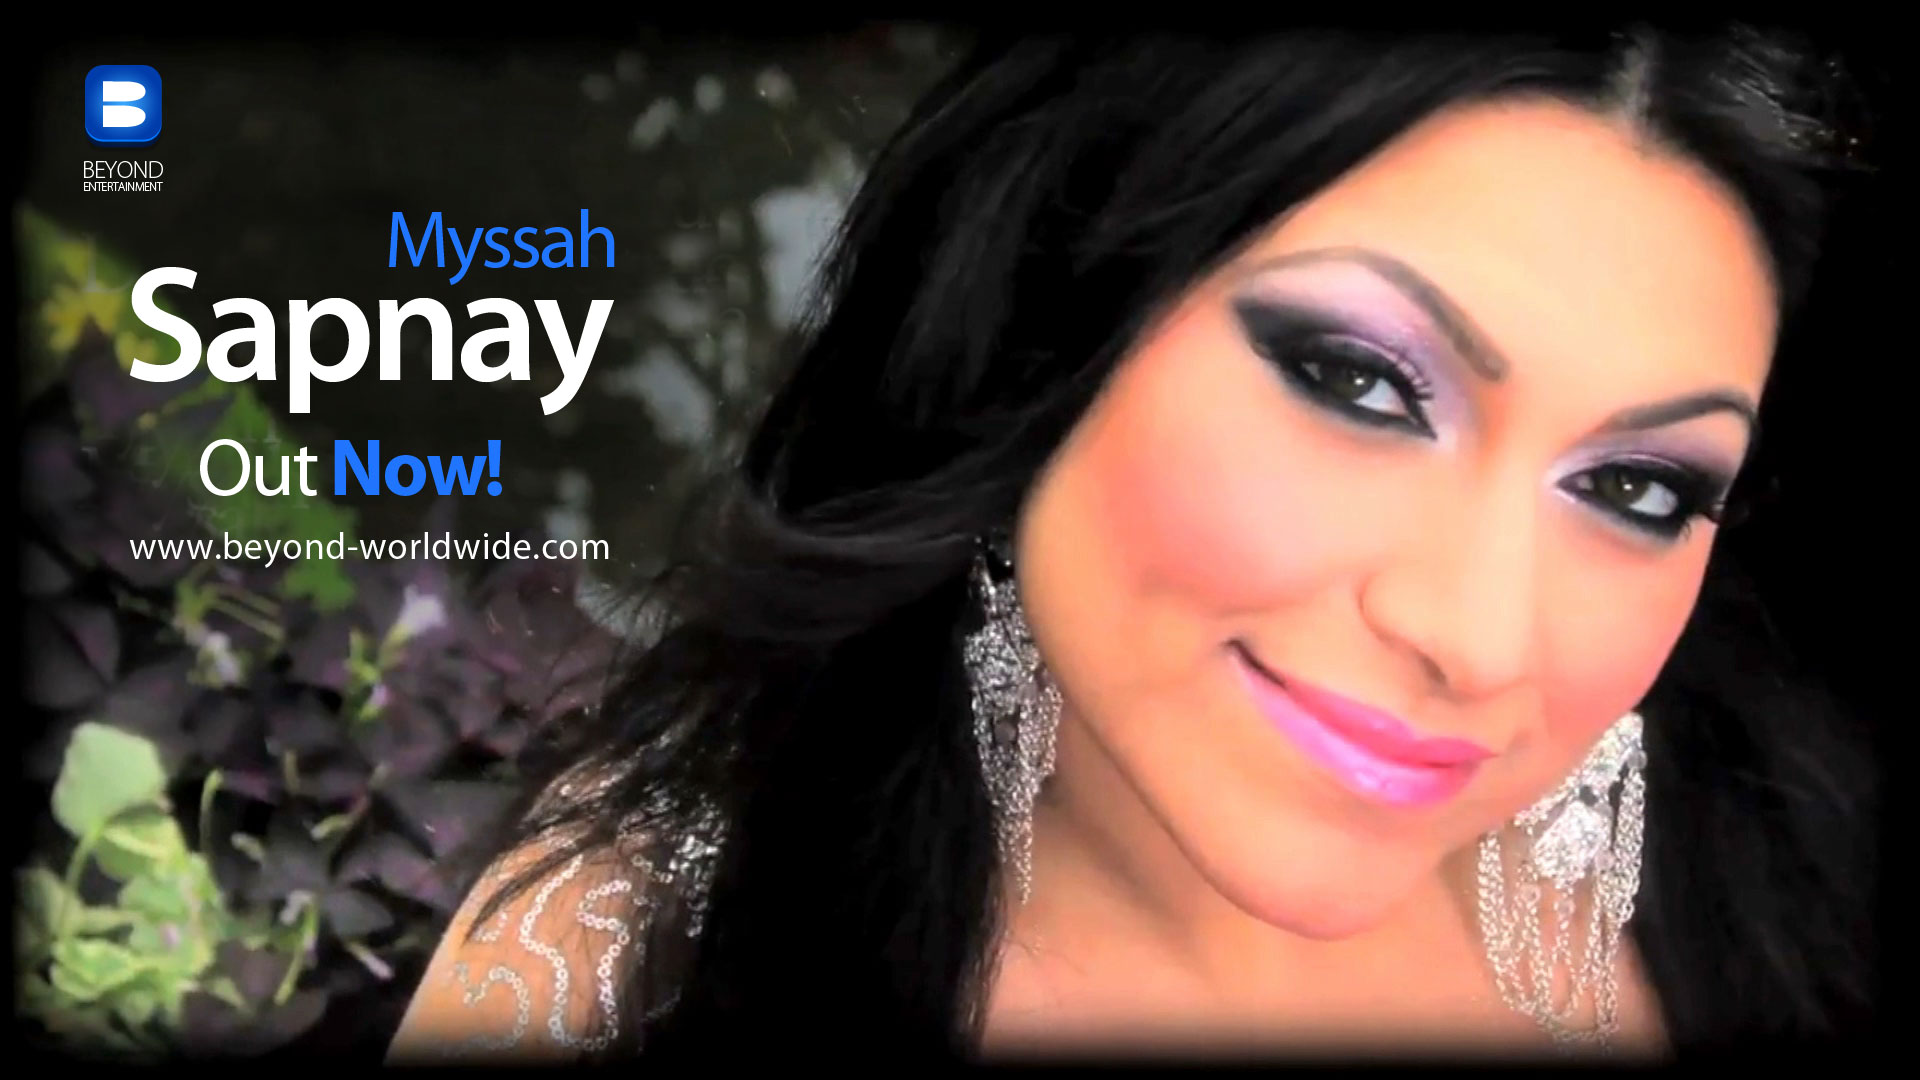 Myssah-sapnay